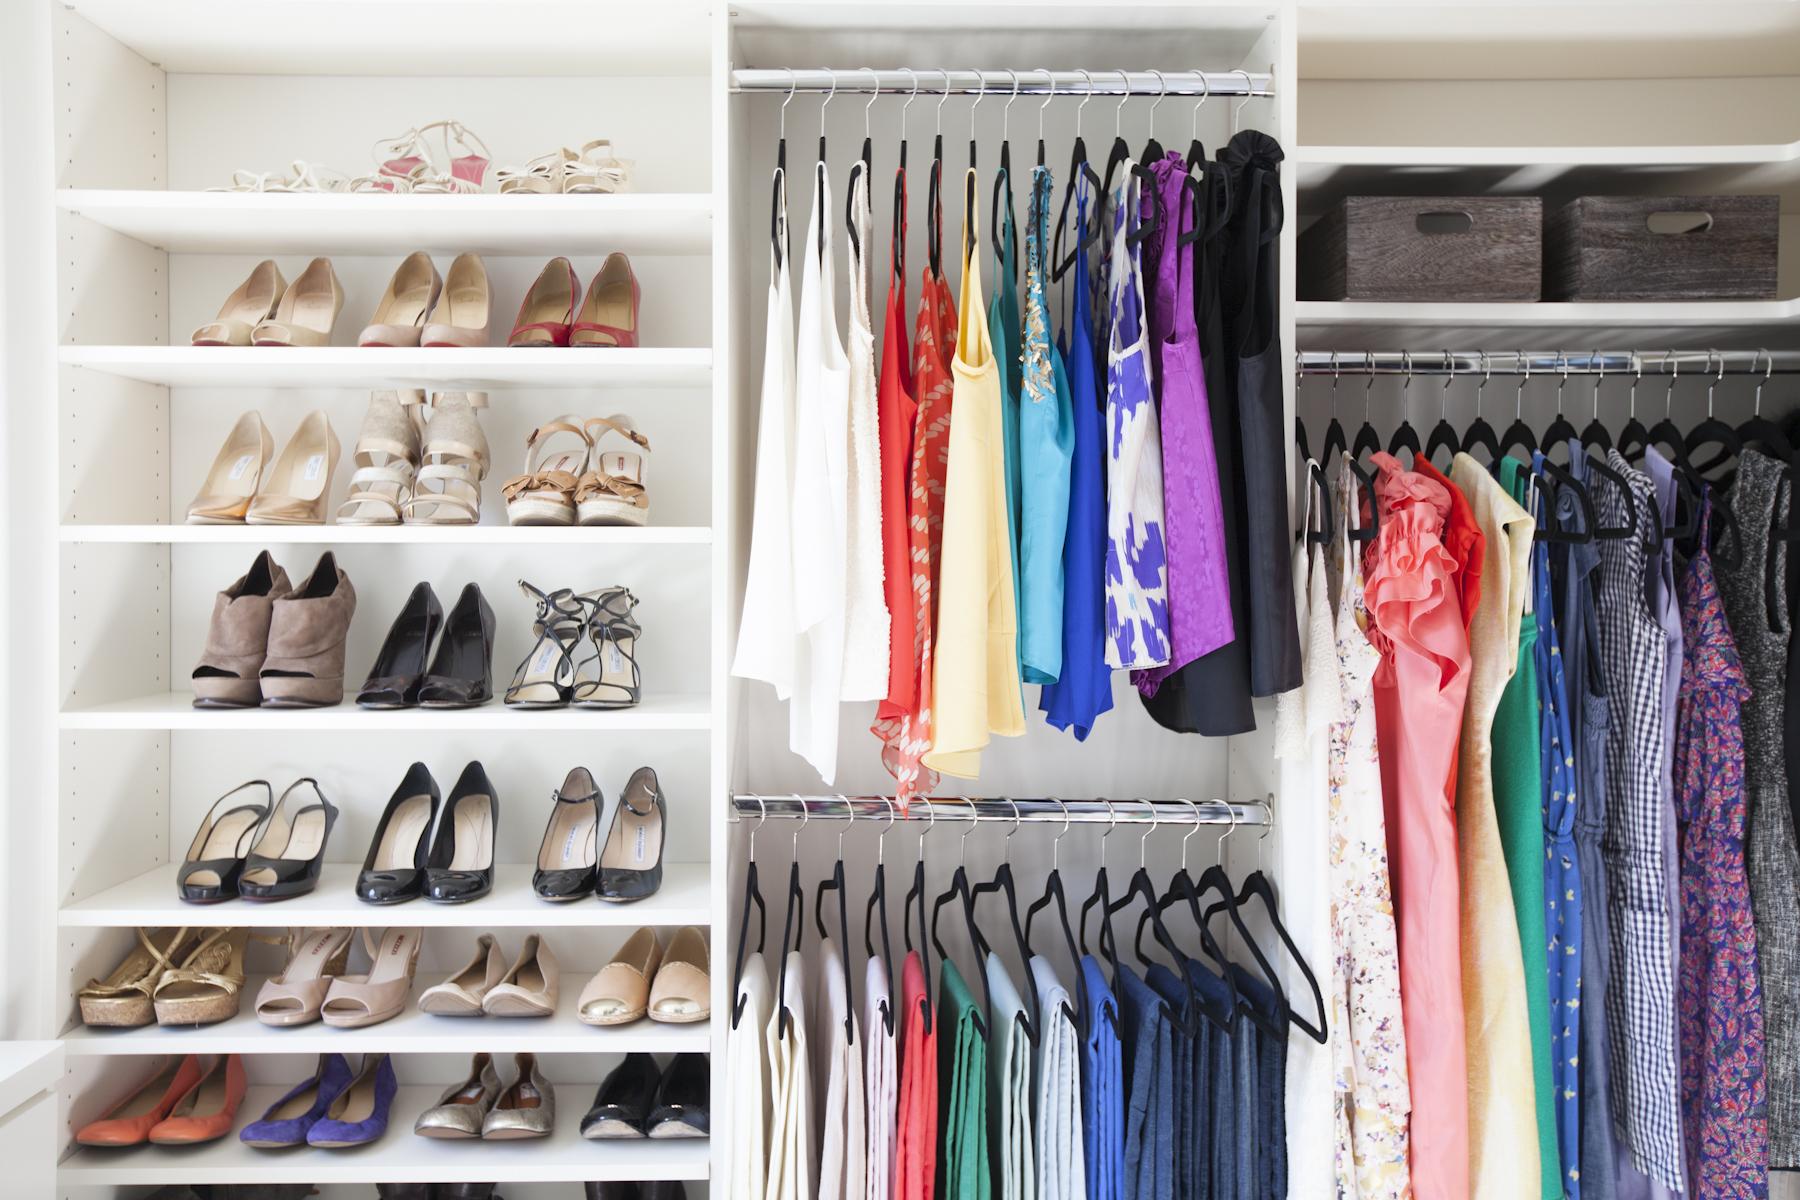 garde-robe—organise-rangement-epuration-organisation-decorer_deco_idees_solutions_trucs_conseils_comment_decoration_interieure_design_interieur_ameublement_quebec_canada